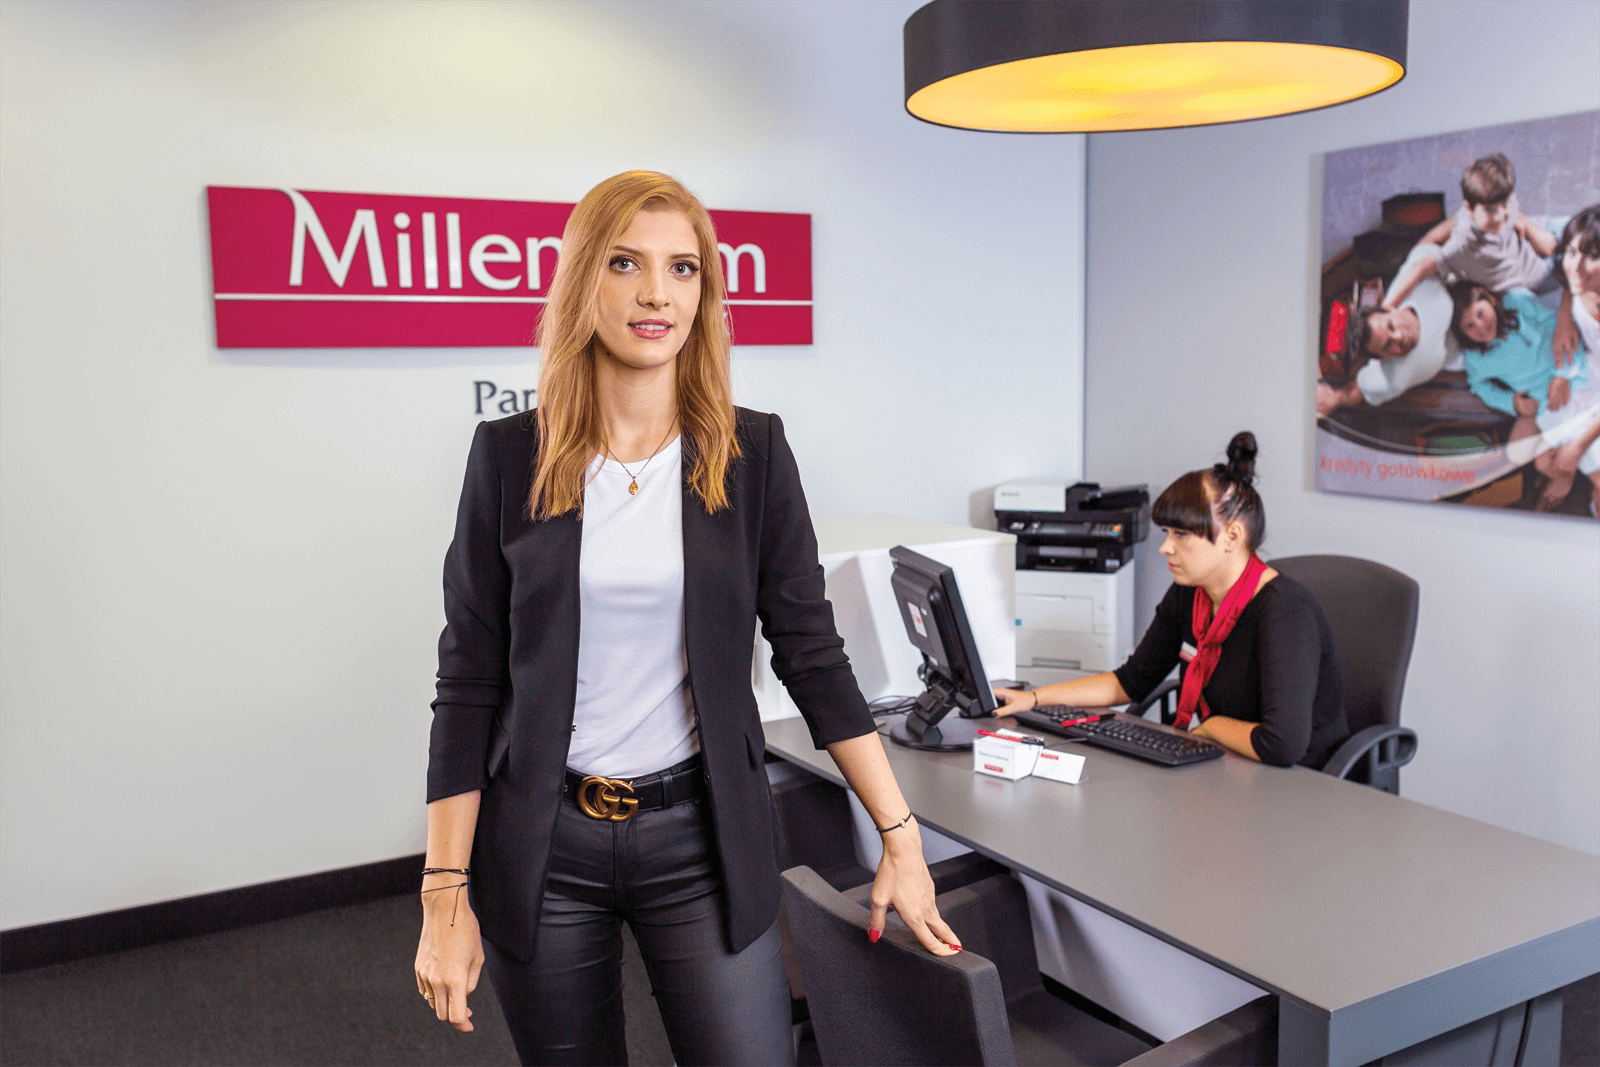 Karolina Kaczmarek, franczyzobiorczyni Banku Millennium